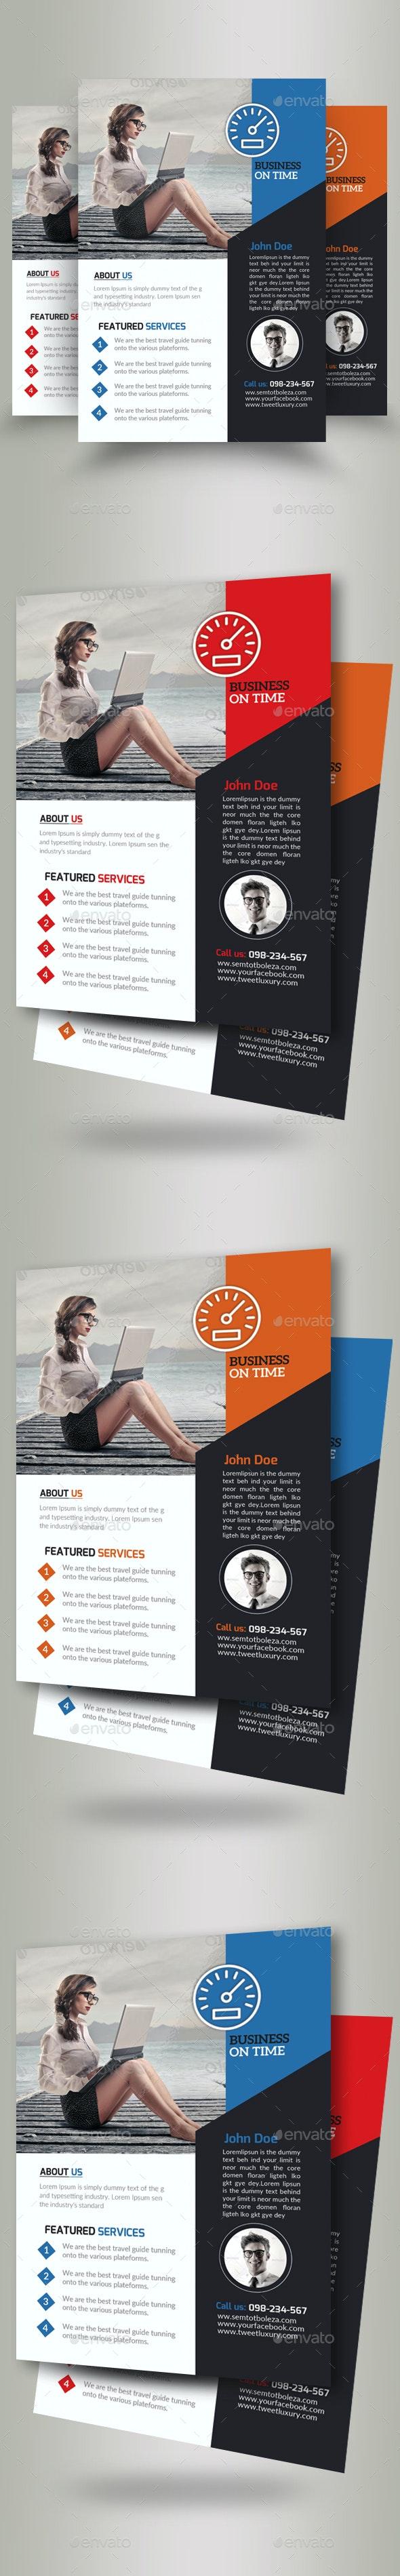 Business Motivation Flyer Template - Corporate Flyers